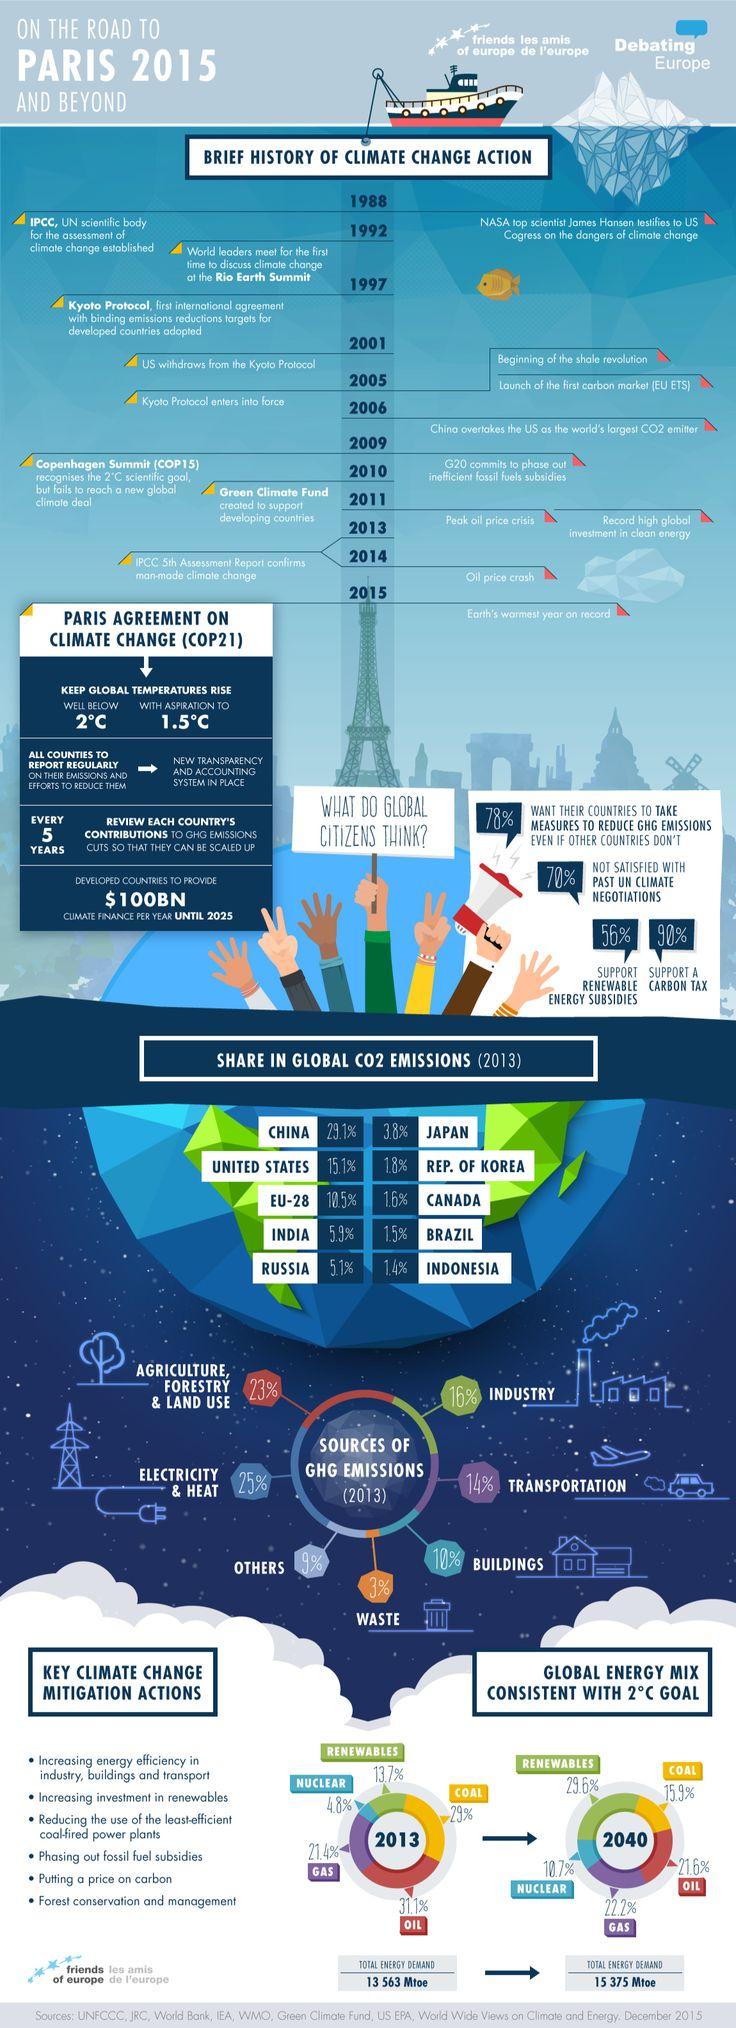 COP21: Paris Climate Agreement at a Glance | Connect4Climate